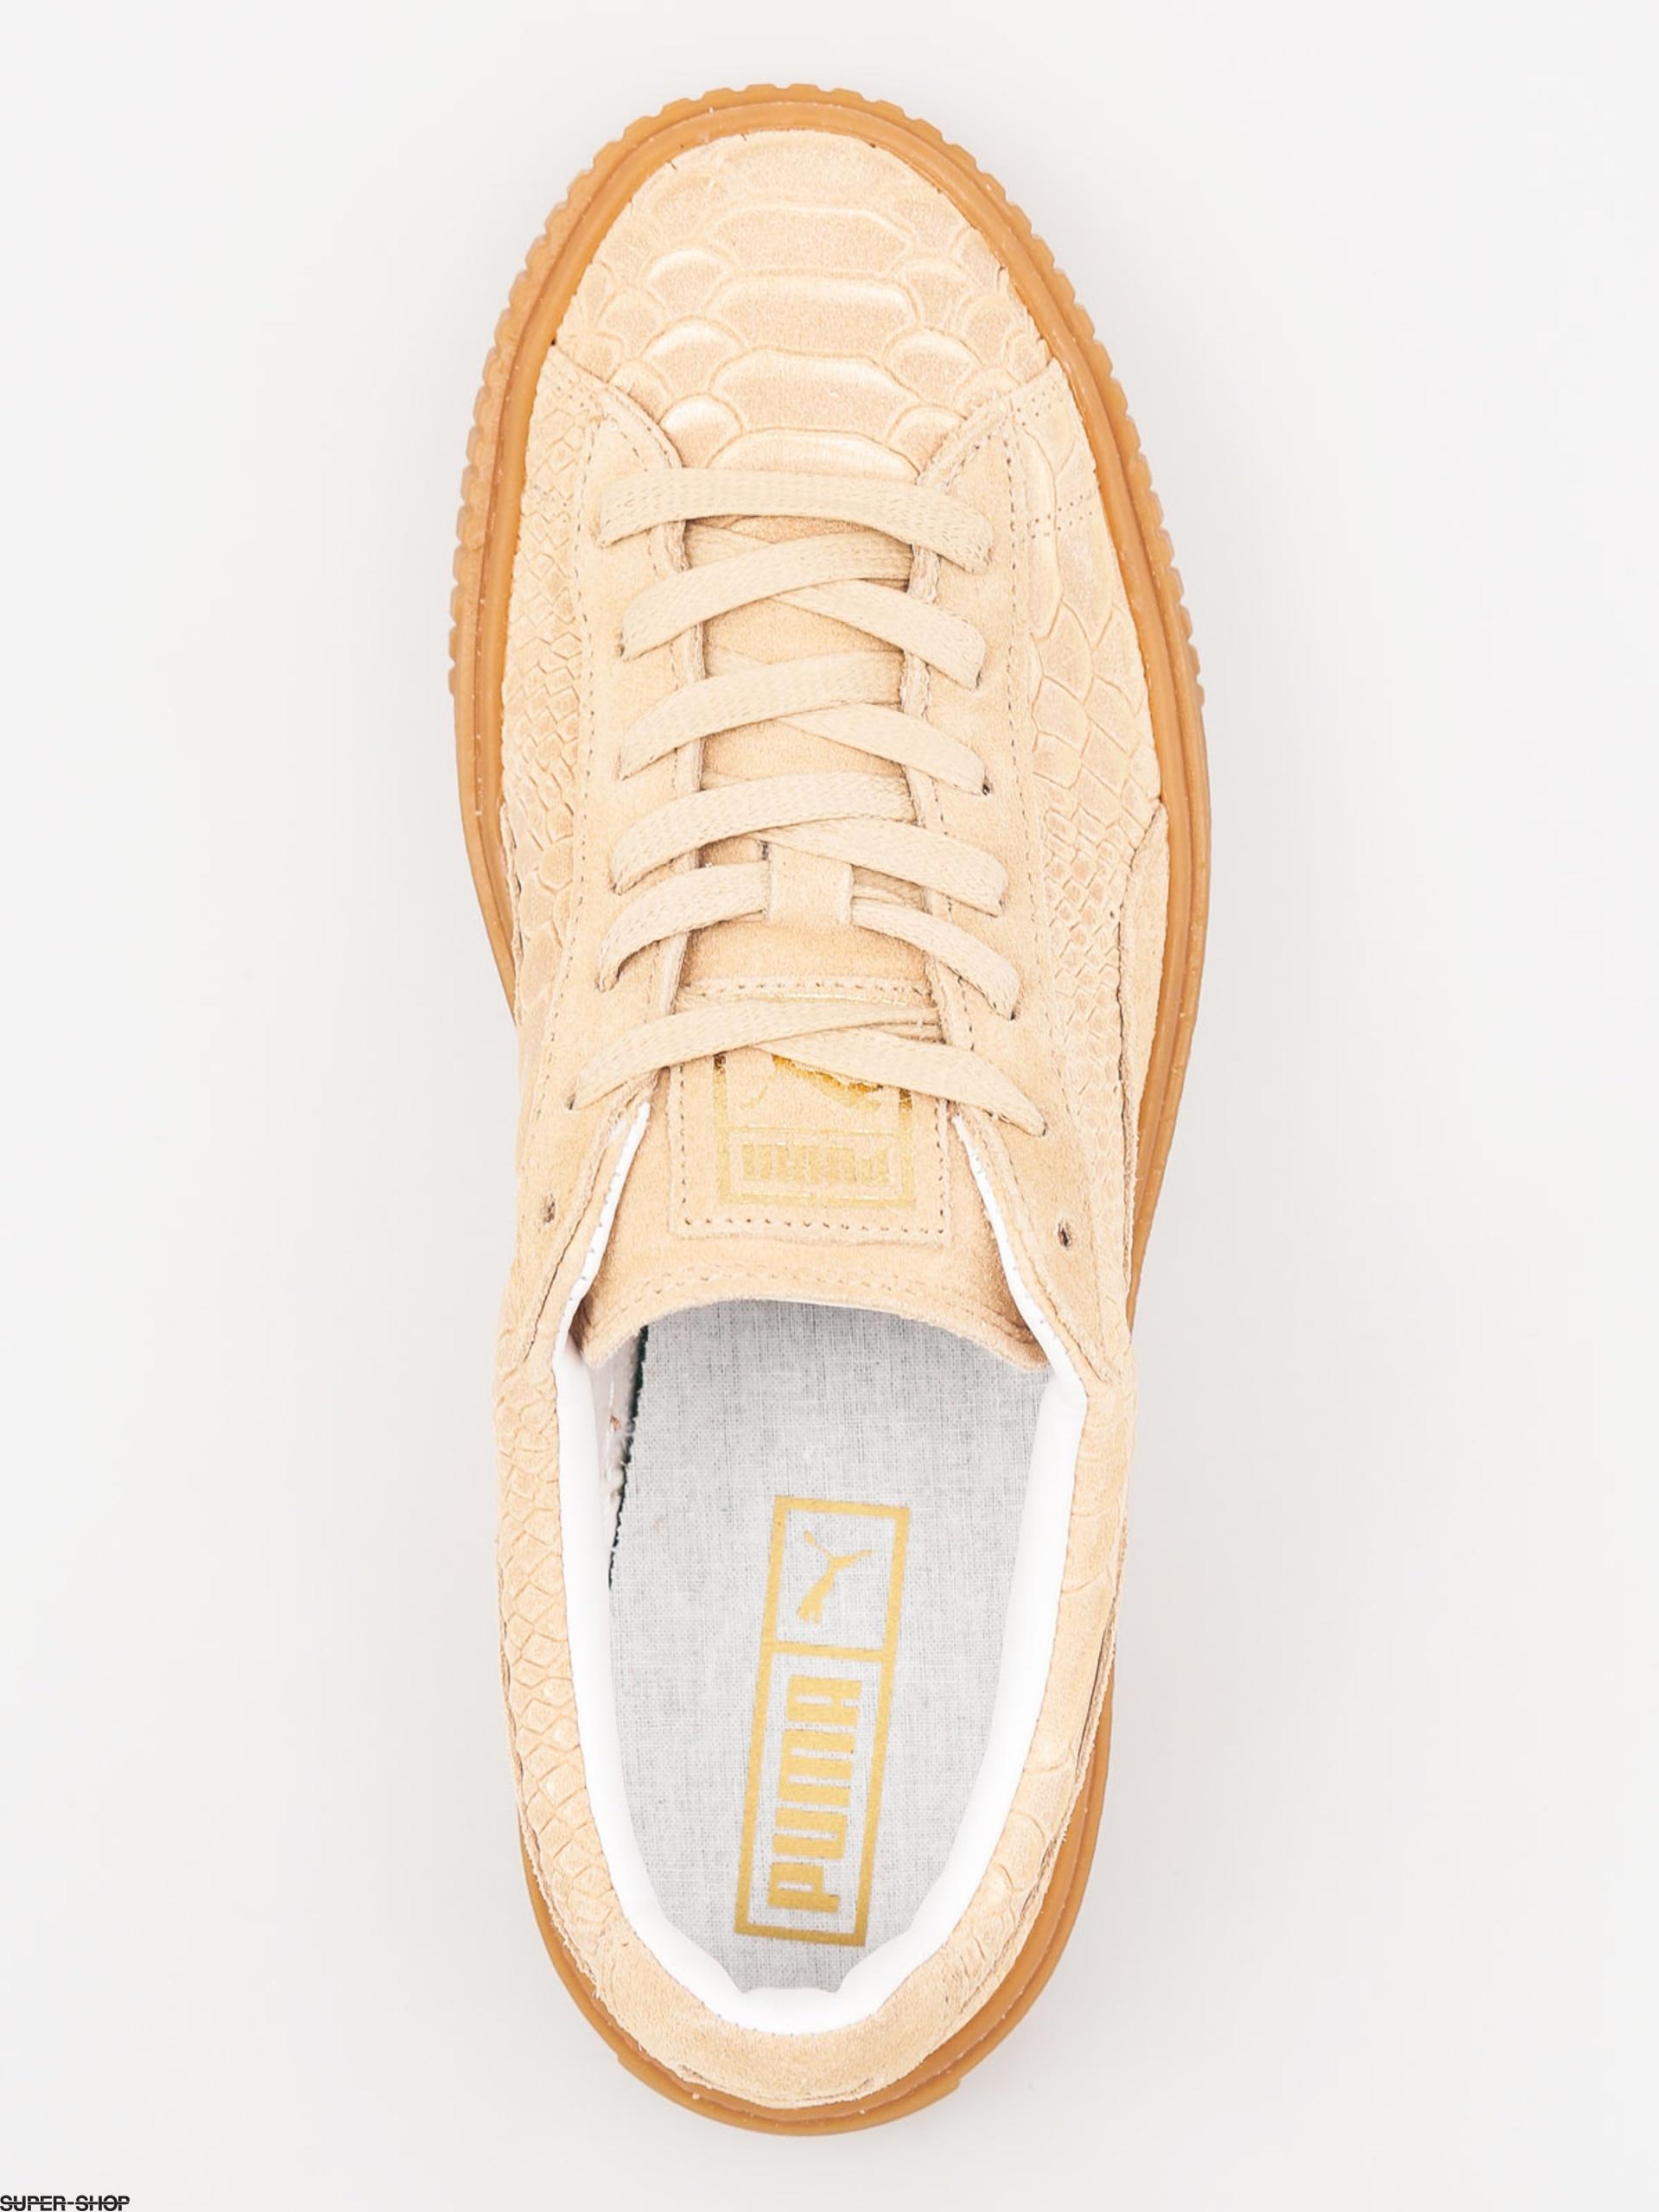 good selling hot sale elegant shoes http://jumble.2020results.com/7-bkbnt/7vl3o8j/ http://www ...